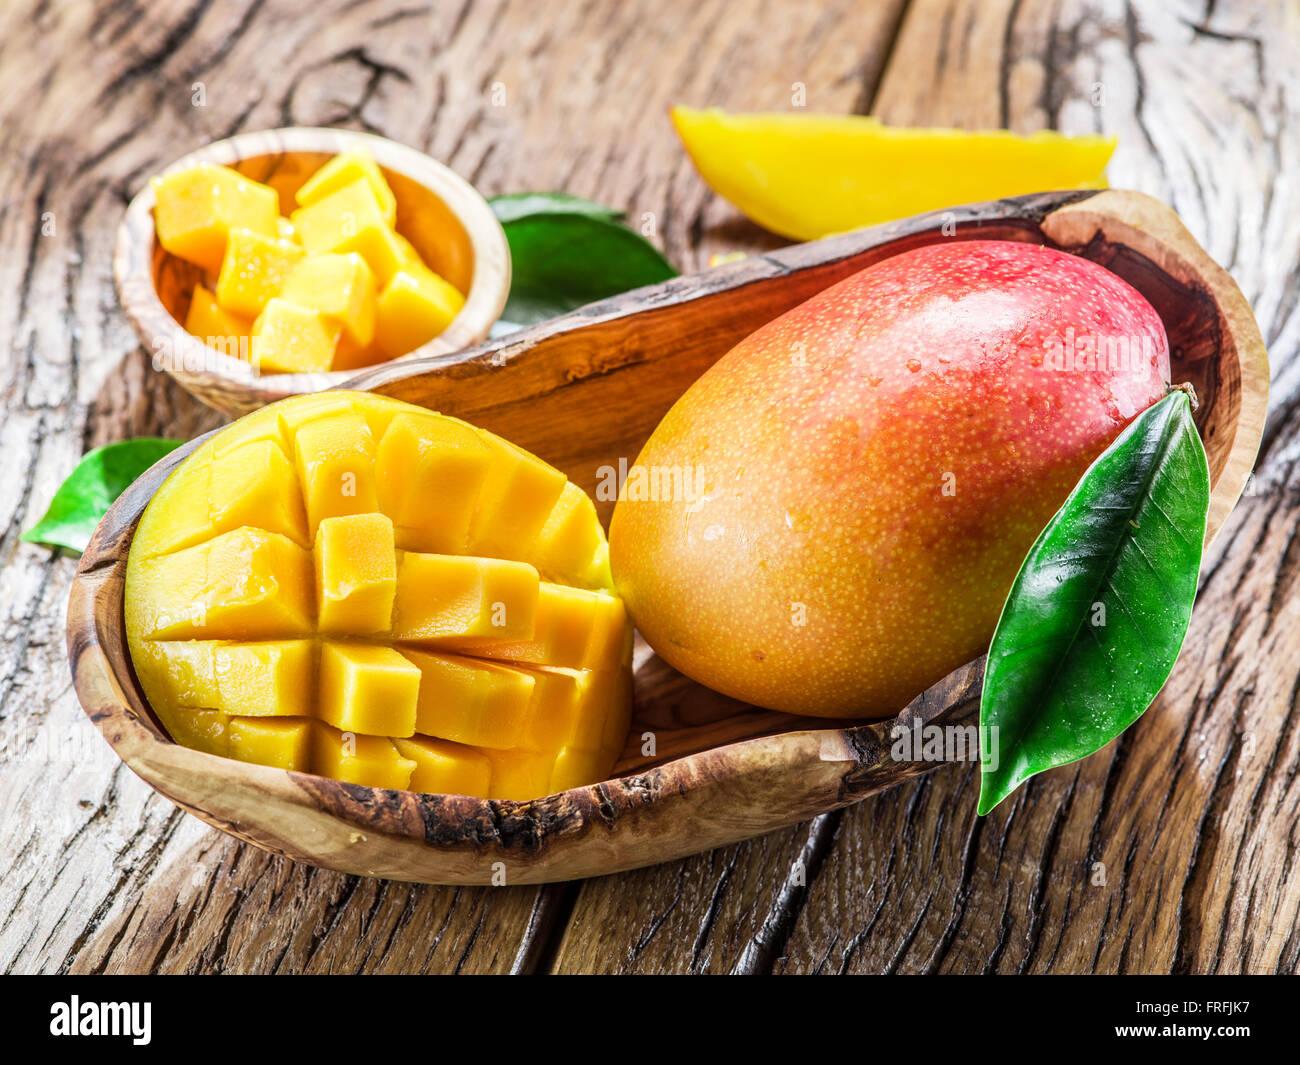 Mango fruit and mango cubes on the wooden table. - Stock Image